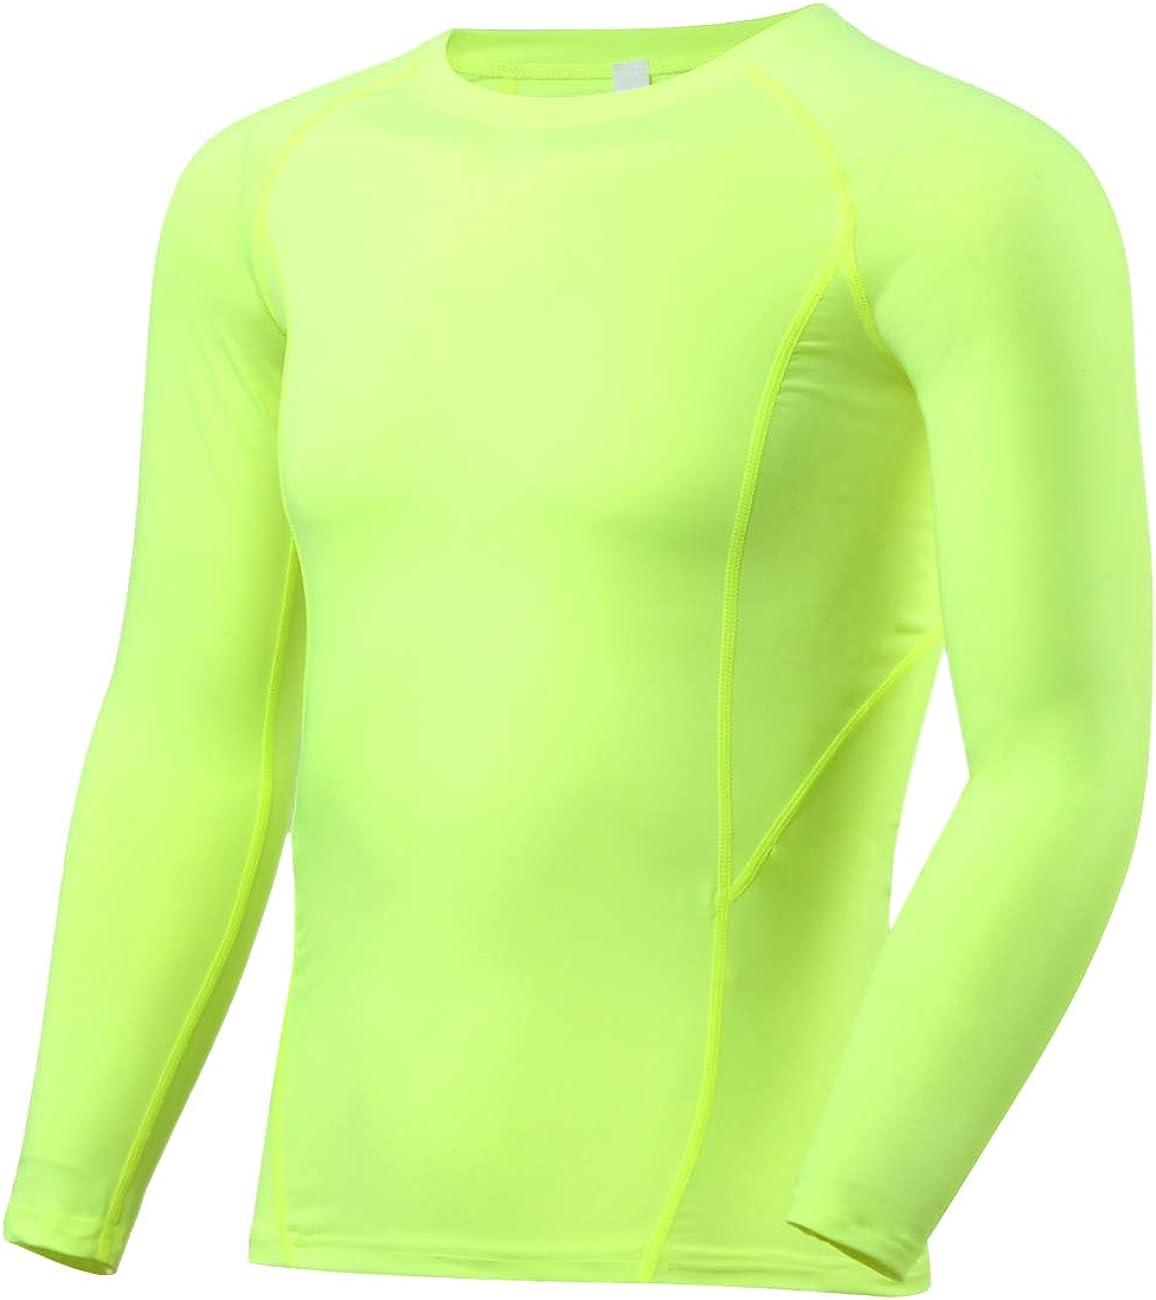 BUYKUD Kids' Boys Long Sleeve Athletic Base Layer Compression Underwear Baseball Soccer Shirt